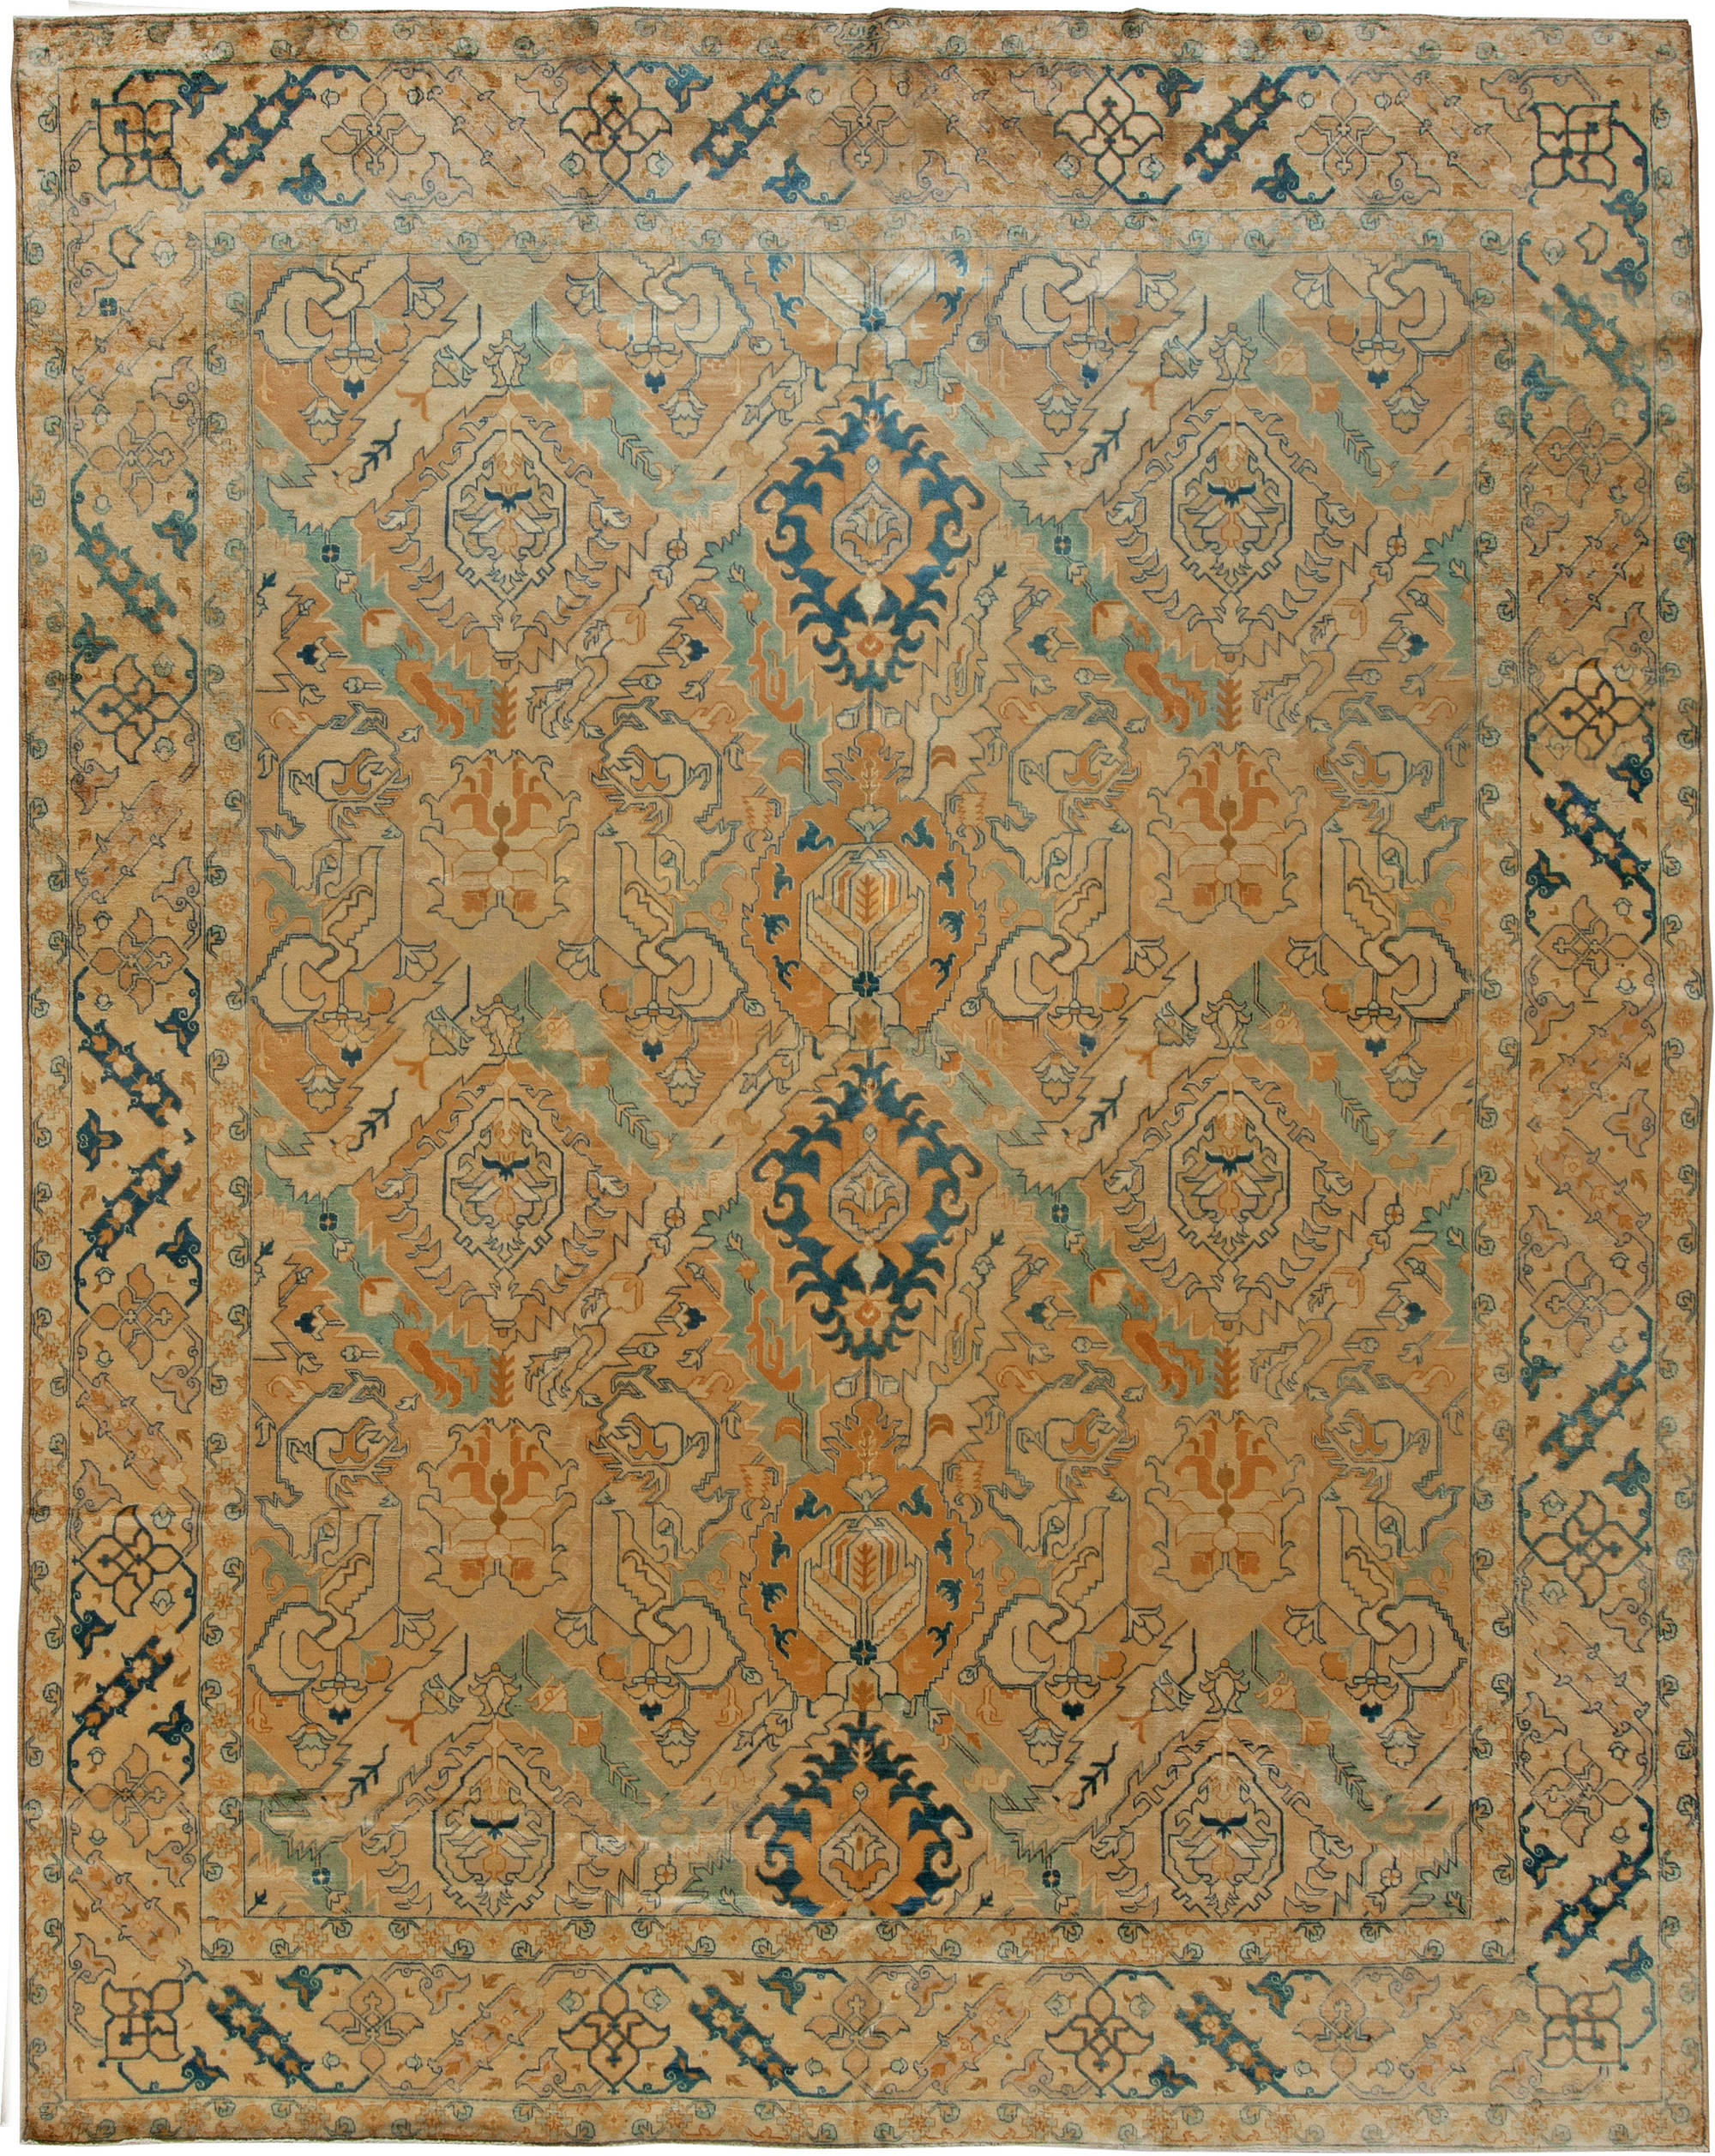 Antique Persian Tabriz Carpet BB5649